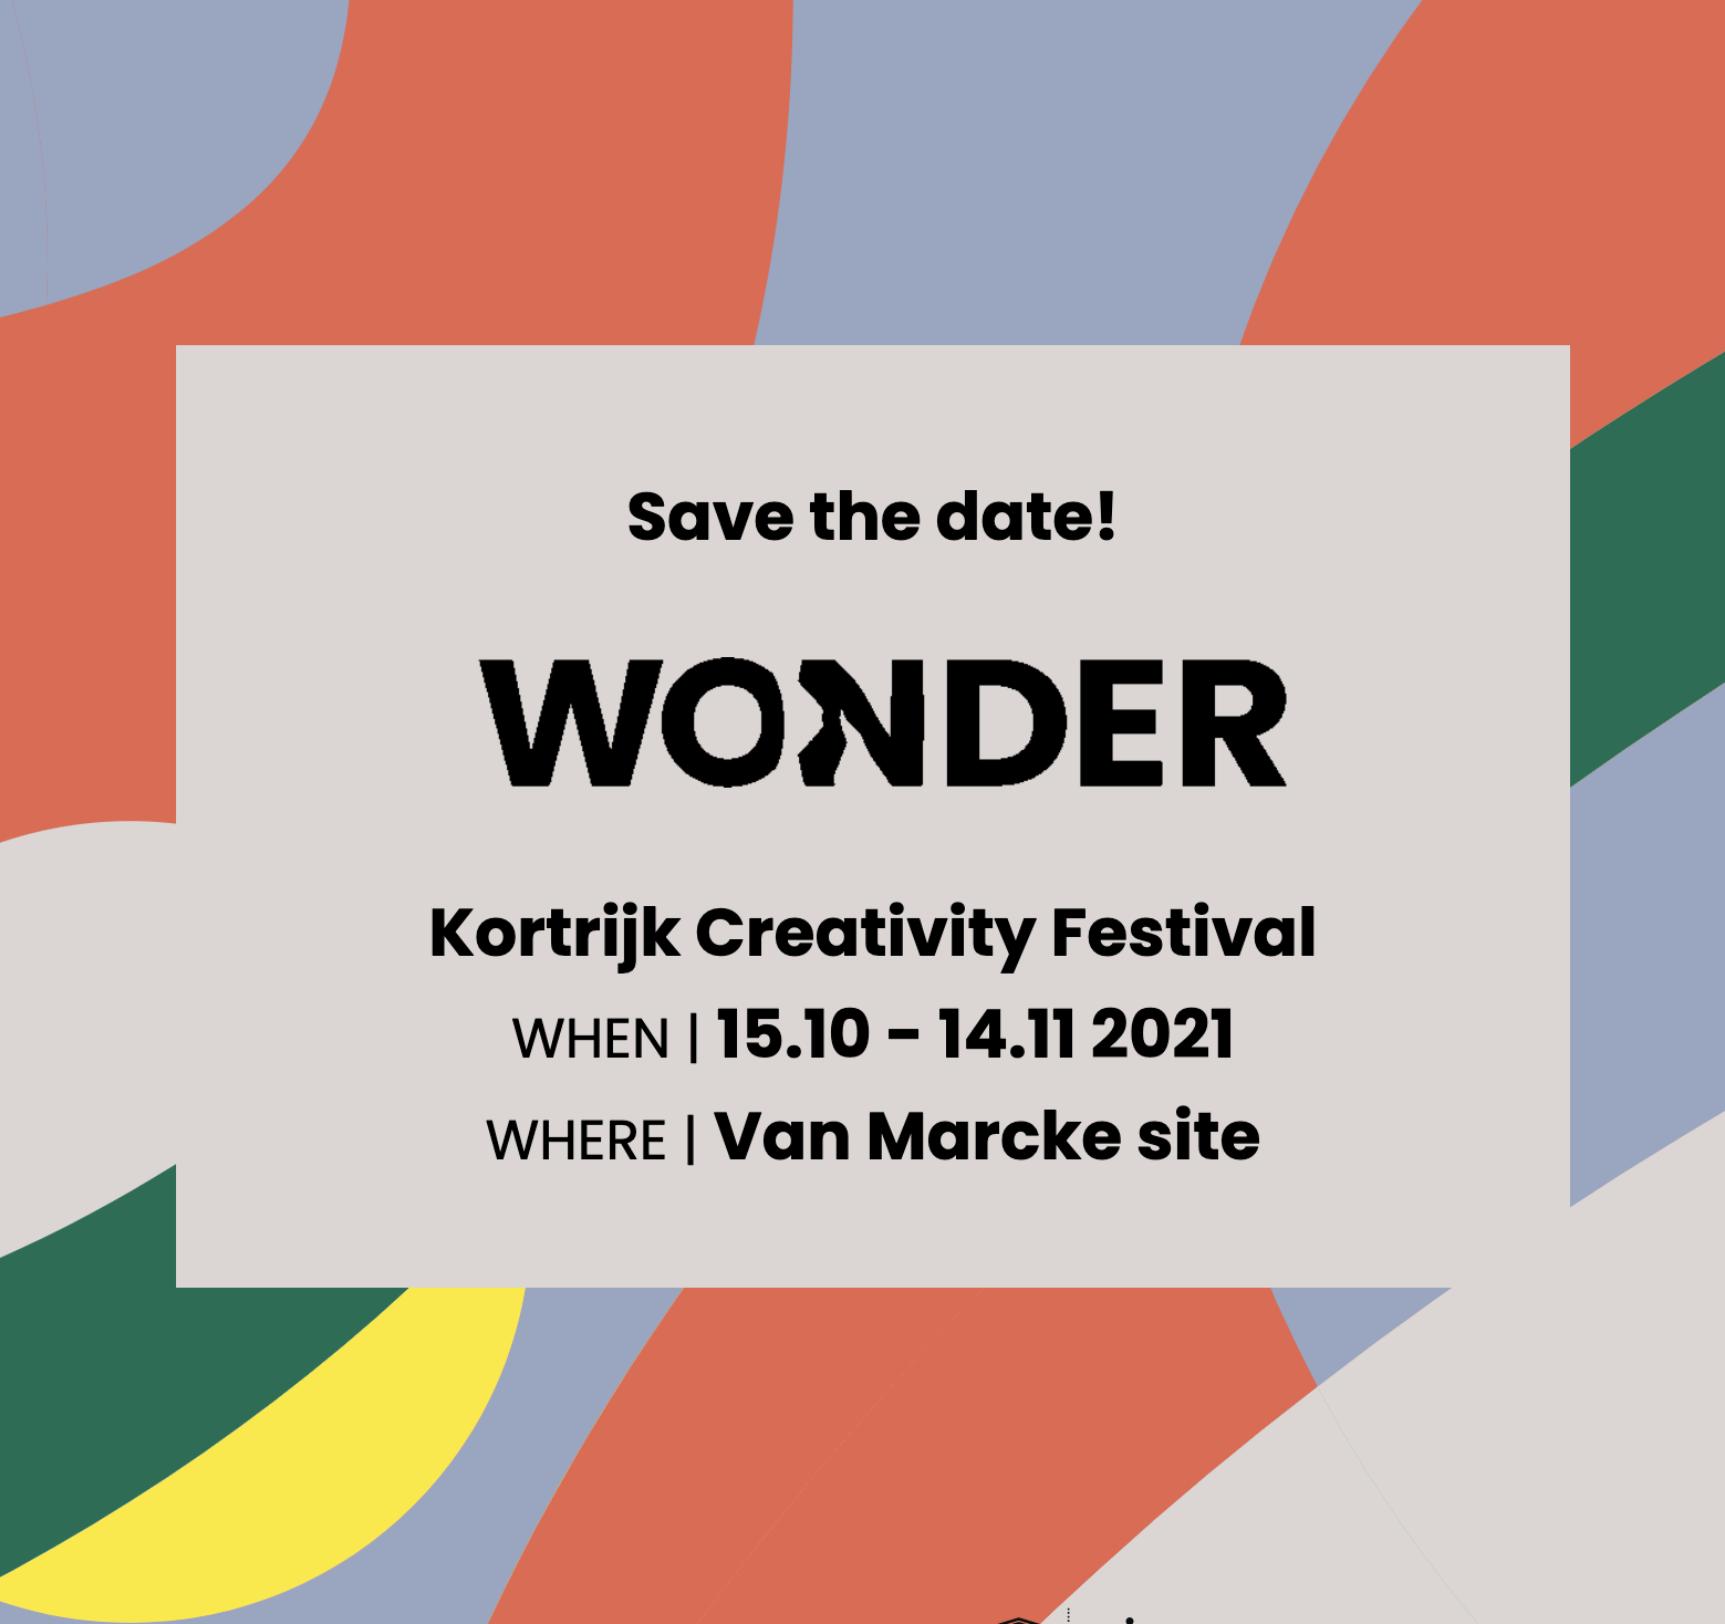 Wonder save the date